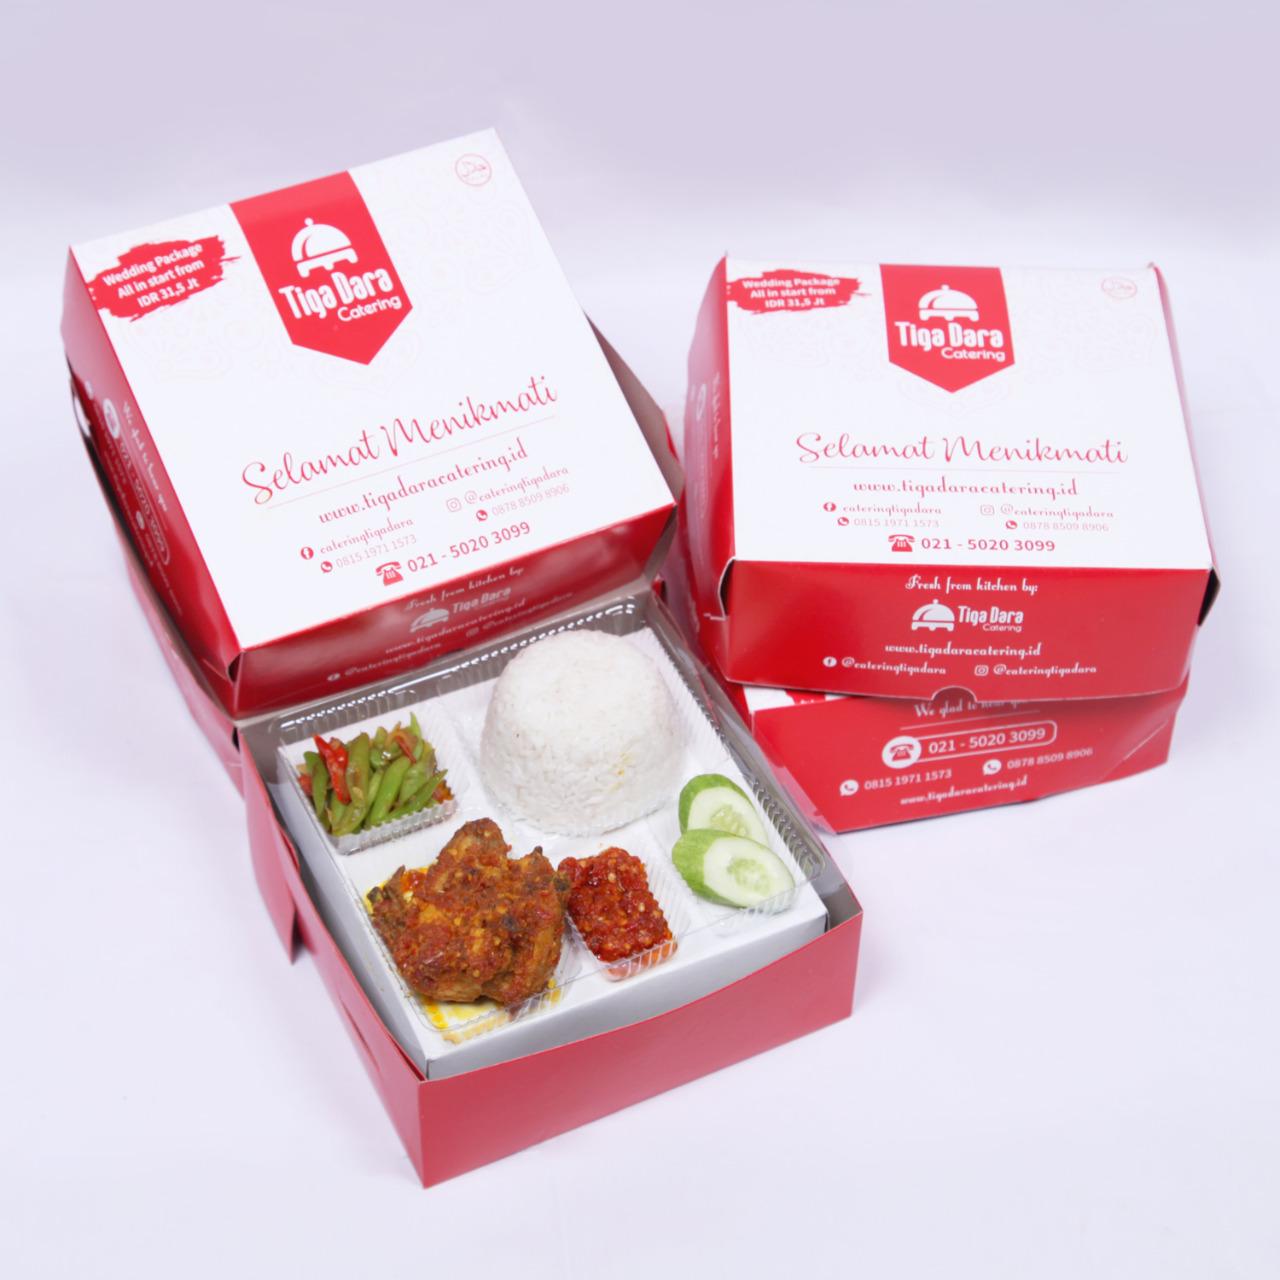 tiga_dara_*Nasi Box Enak & Murah_Economy Class | Paket 2